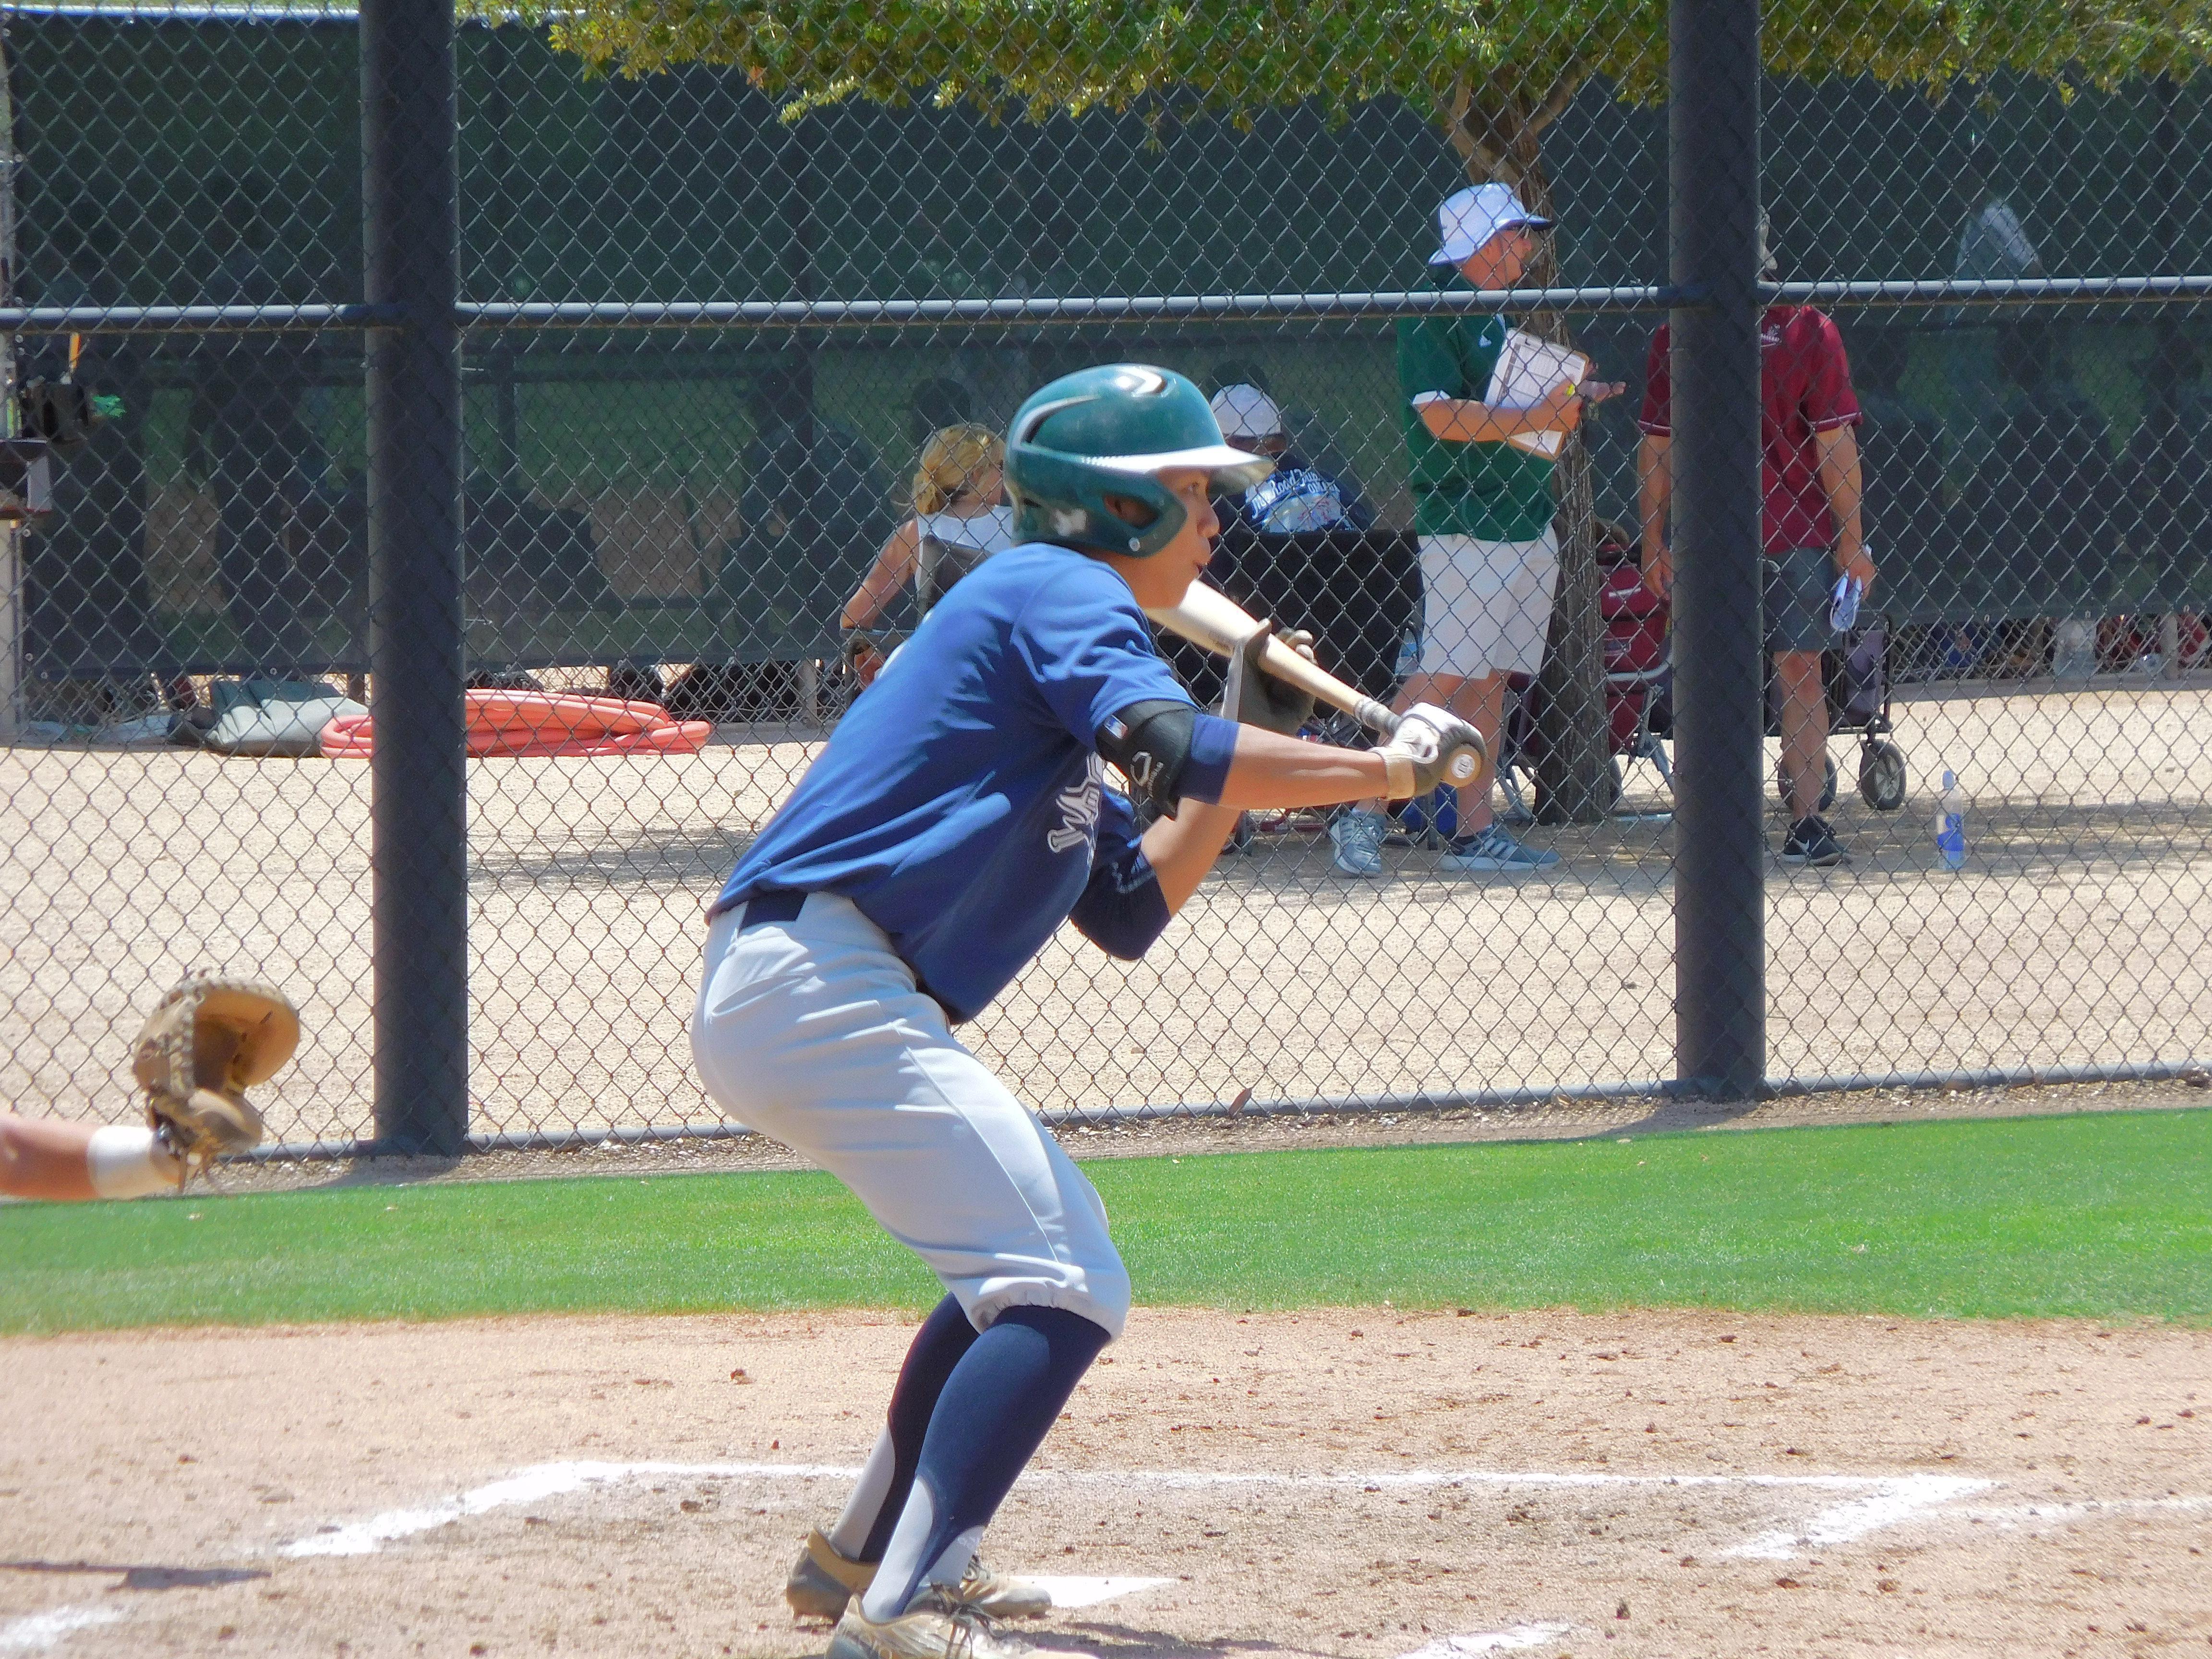 808 Baseball Academy